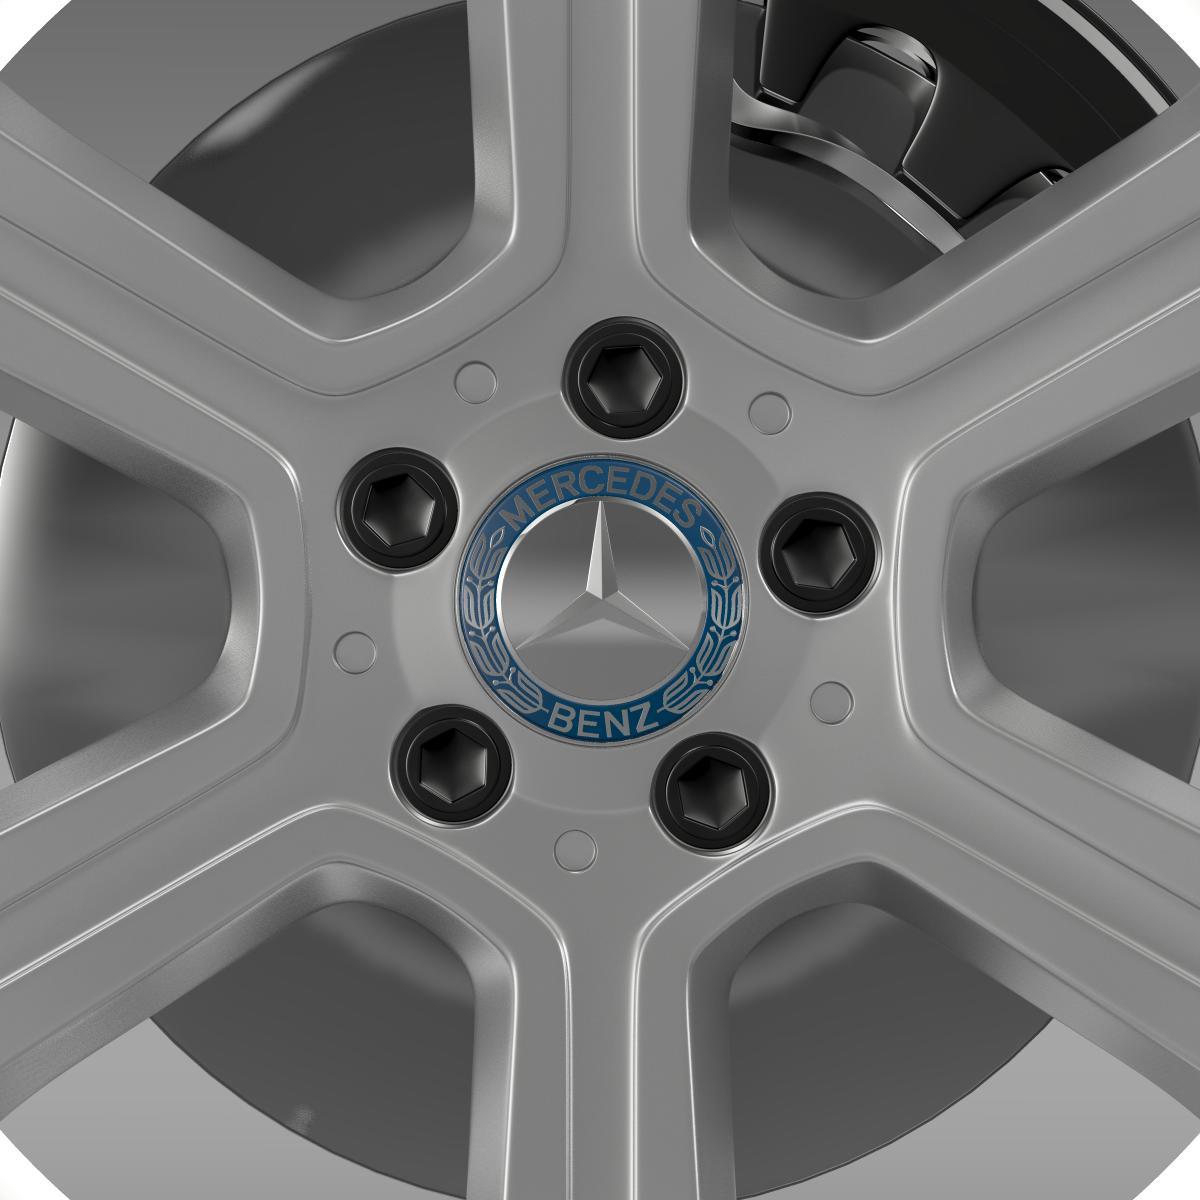 mercedes benz c 300 exclusive line wheel 3d model 3ds max fbx c4d lwo ma mb hrc xsi obj 210774